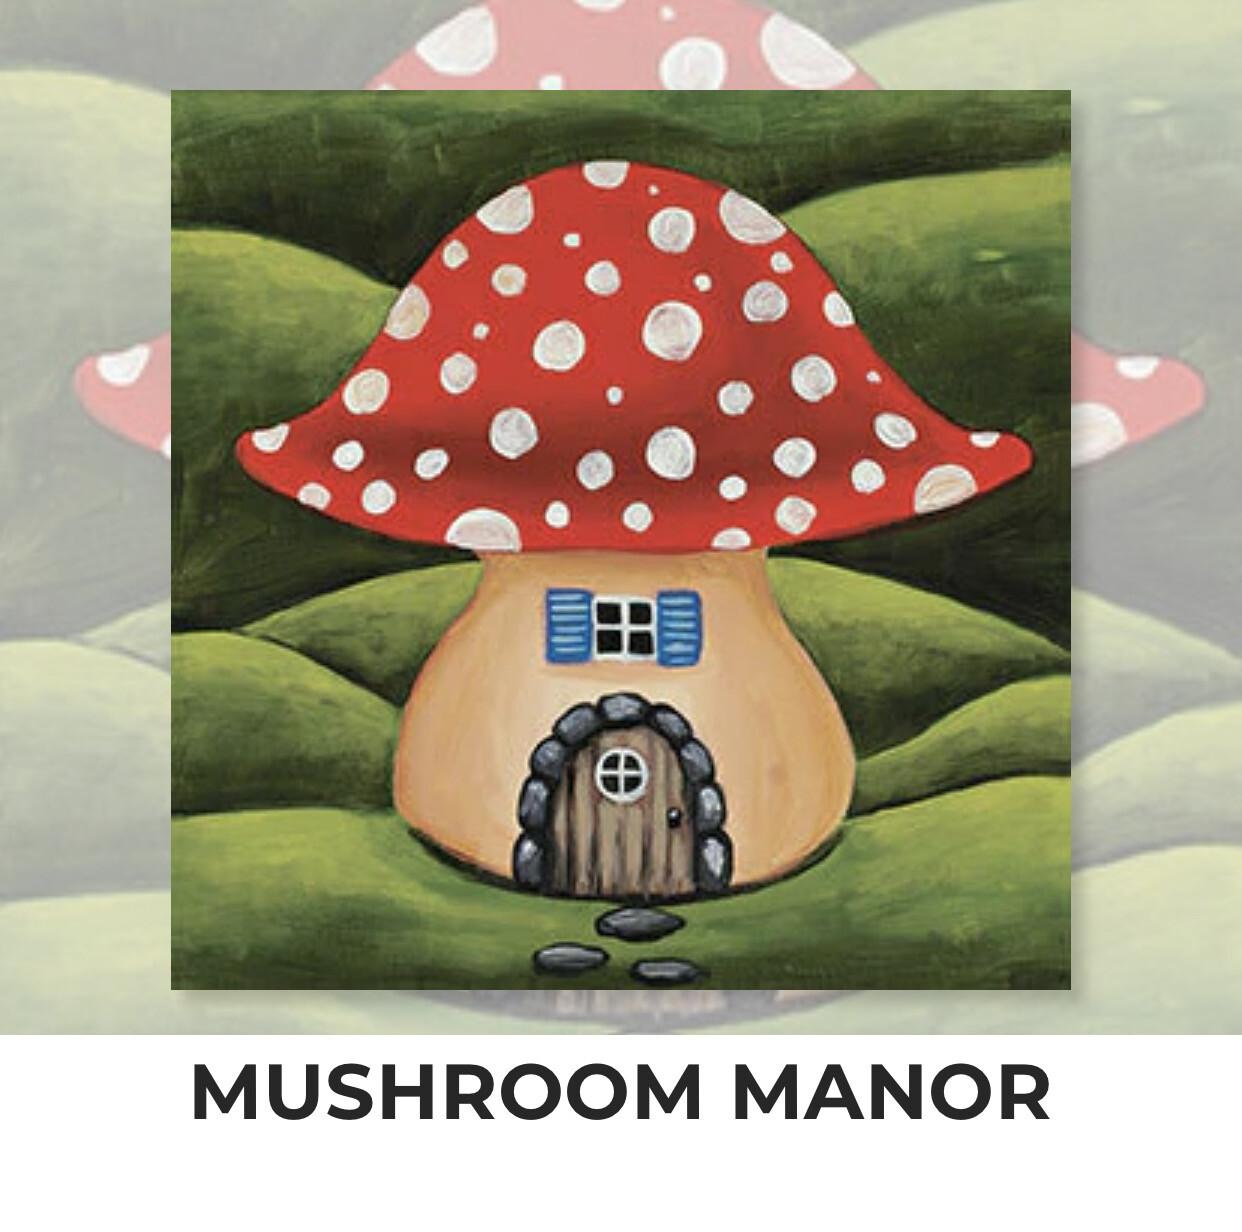 Mushroom Manor KIDS Acrylic Paint On Canvas DIY Art Kit - 3 Week Special Order